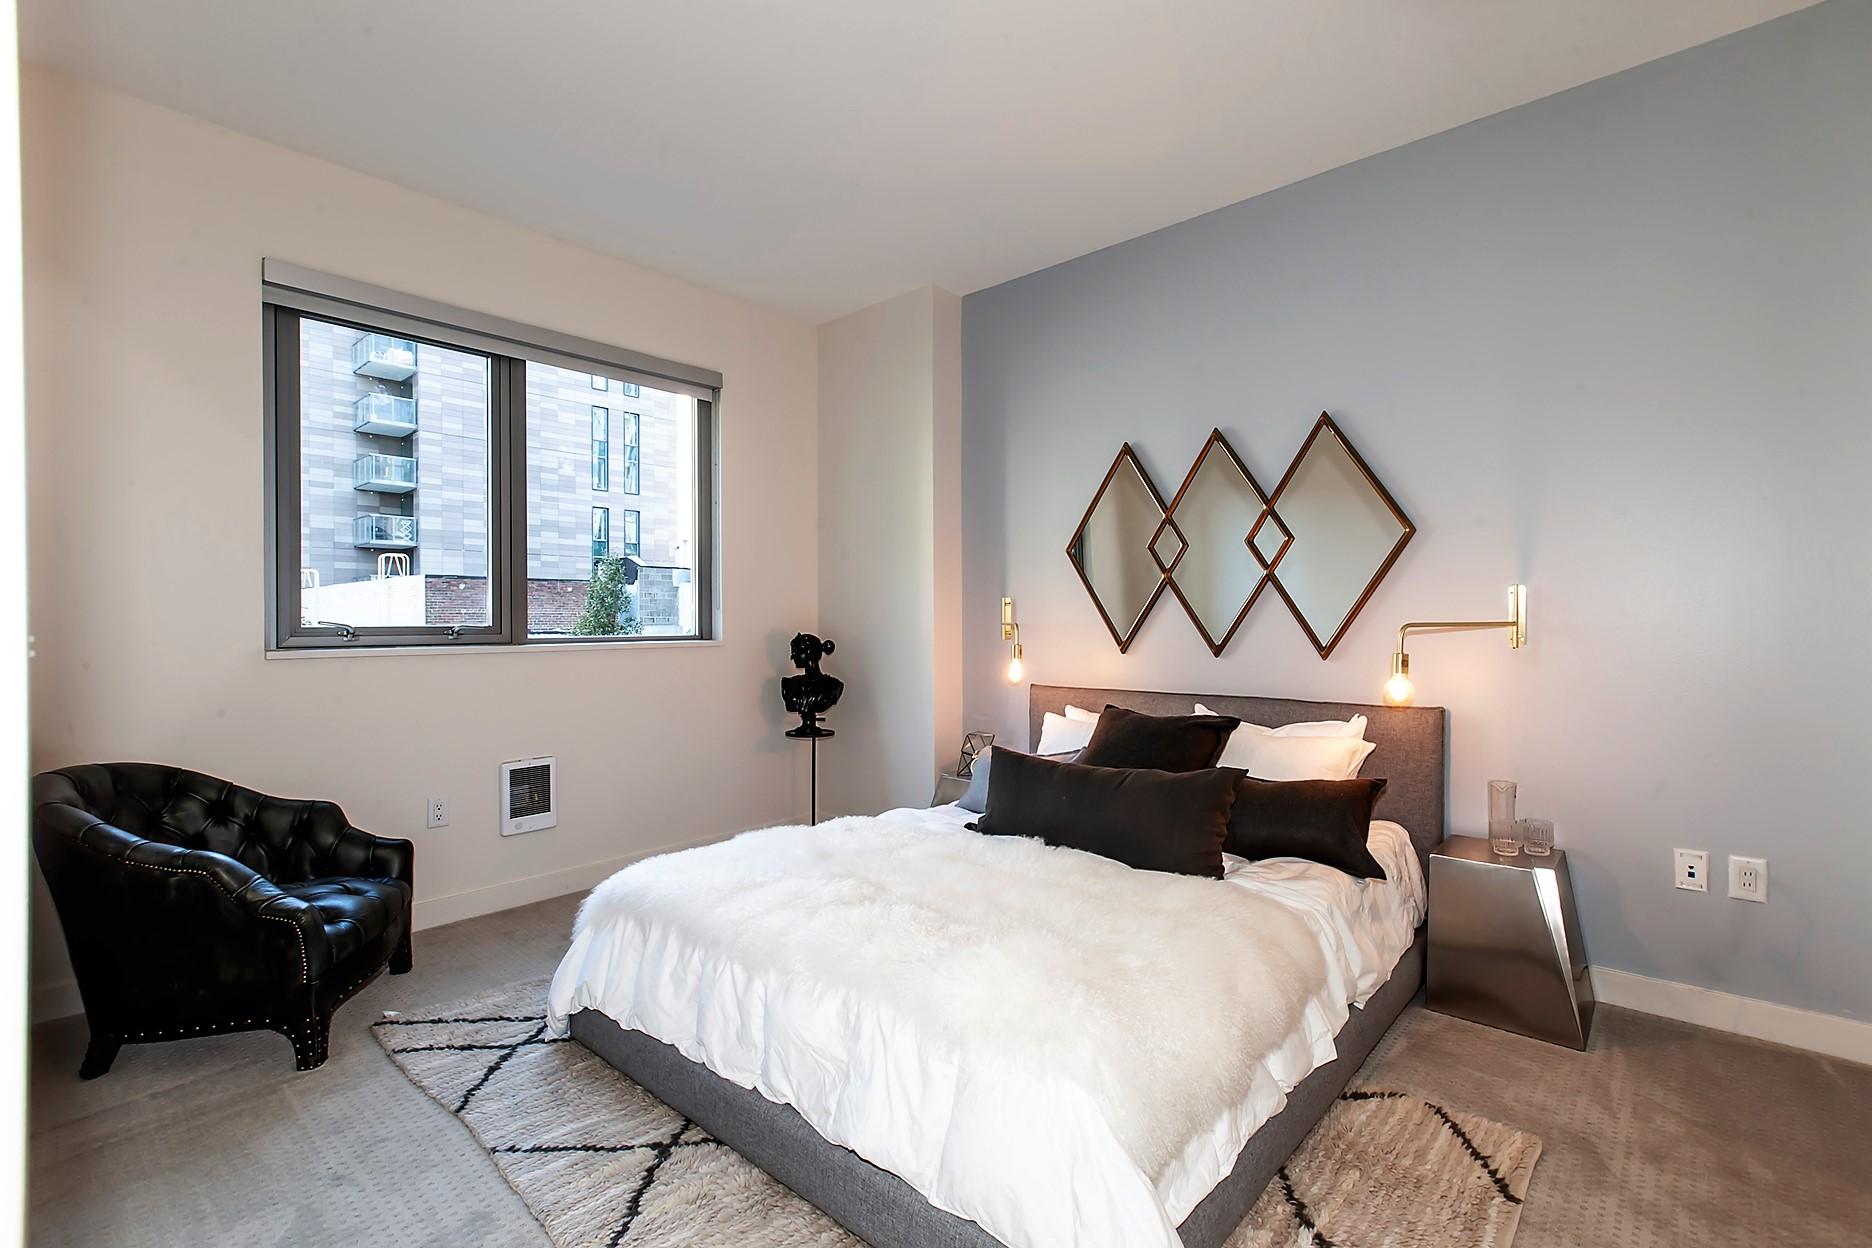 Bedroom at Argenta Apartment, Hayes Valley, San Francisco